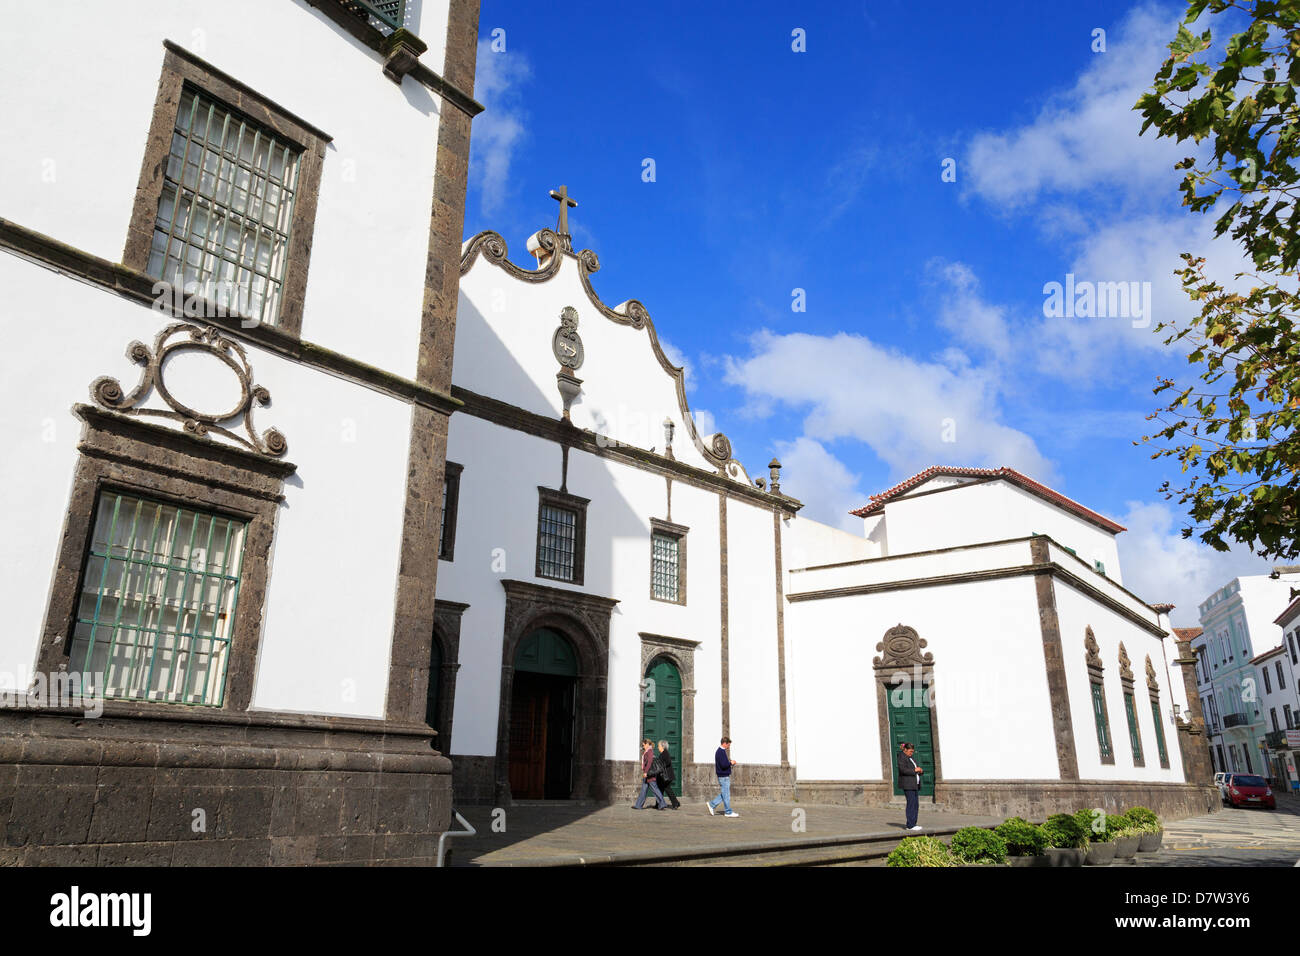 Convento da Esperanca, Ponta Delgada City, Sao Miguel Island, Azores, Portugal - Stock Image